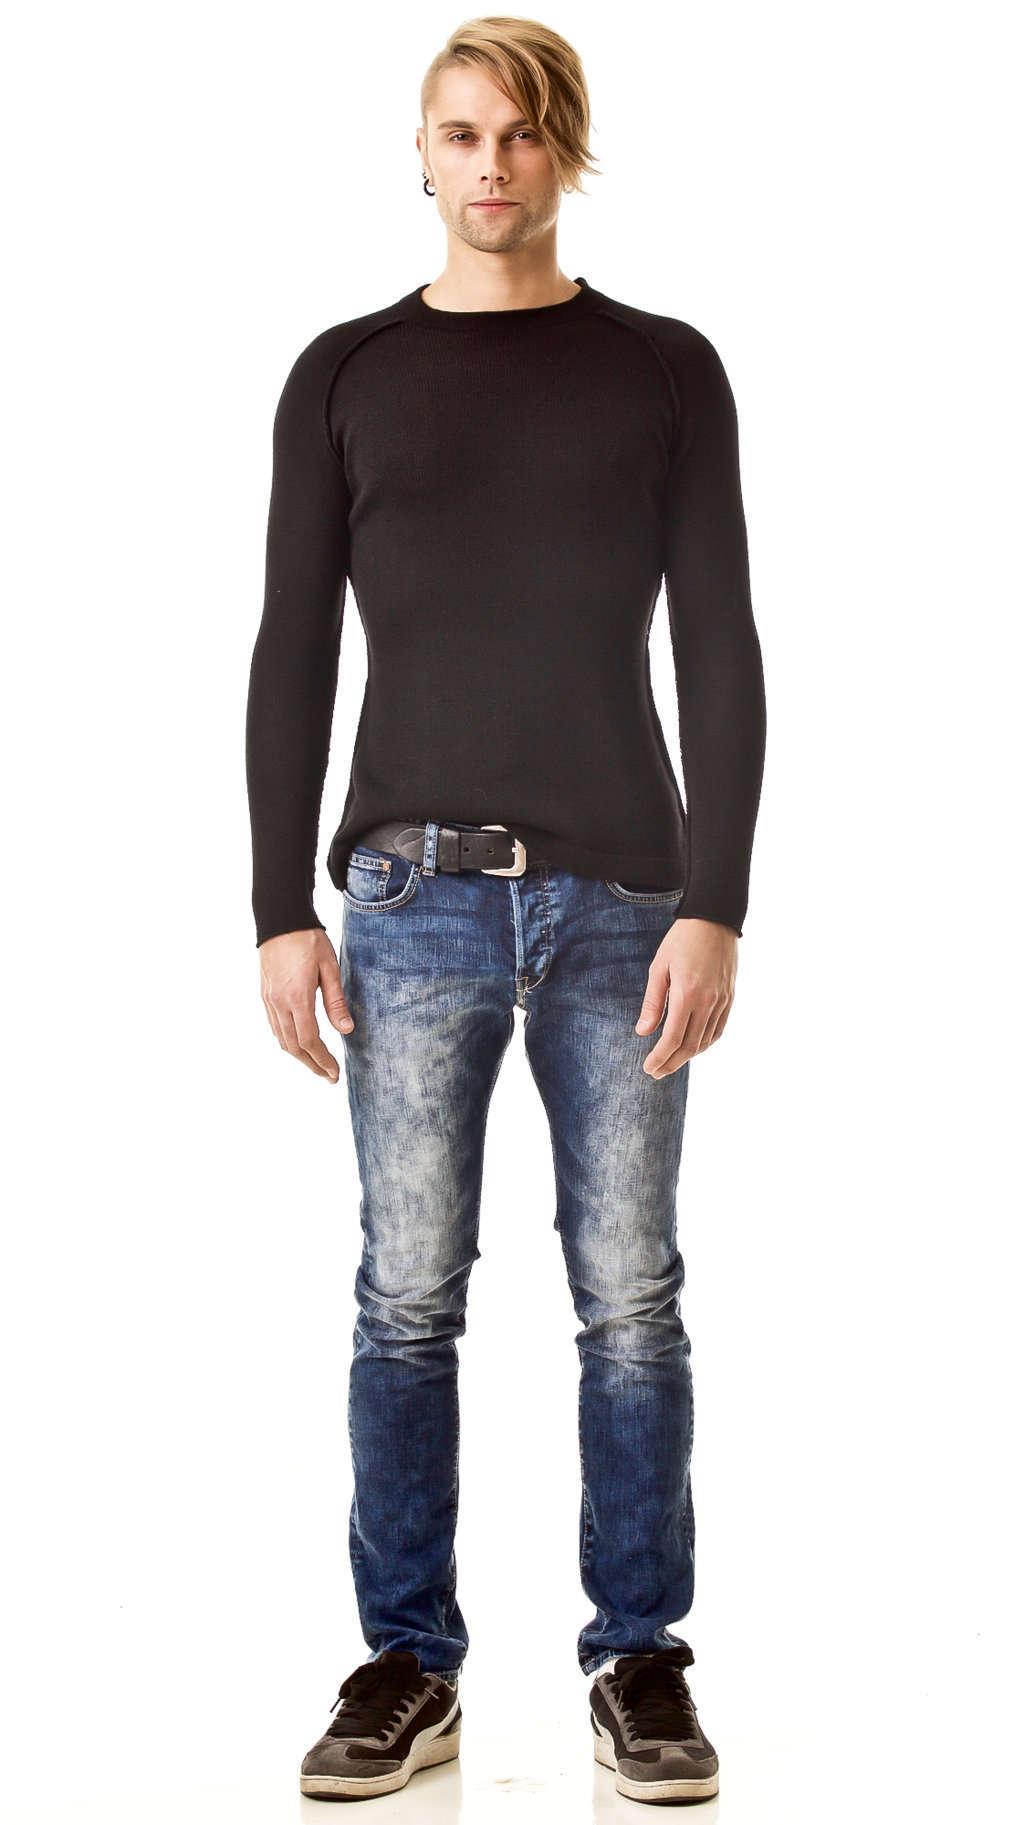 Men's sweater JEAN | Color: black